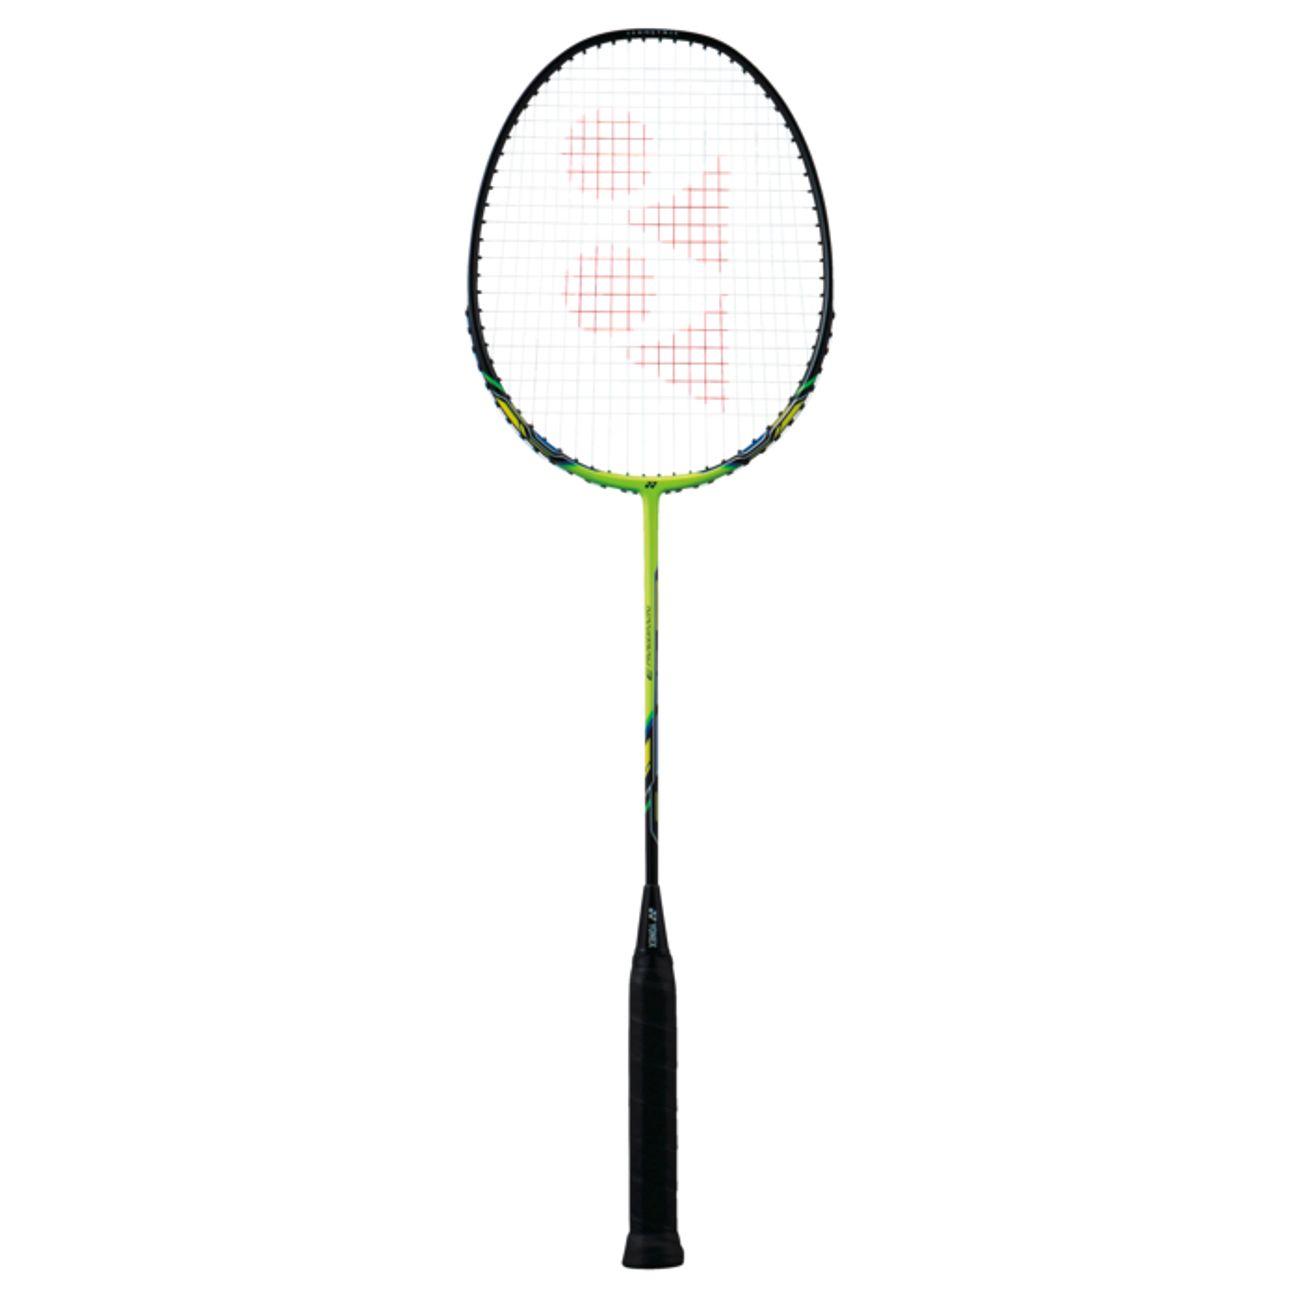 RAQUETTE Badminton mixte YONEX NANORAY-3 LIME, U